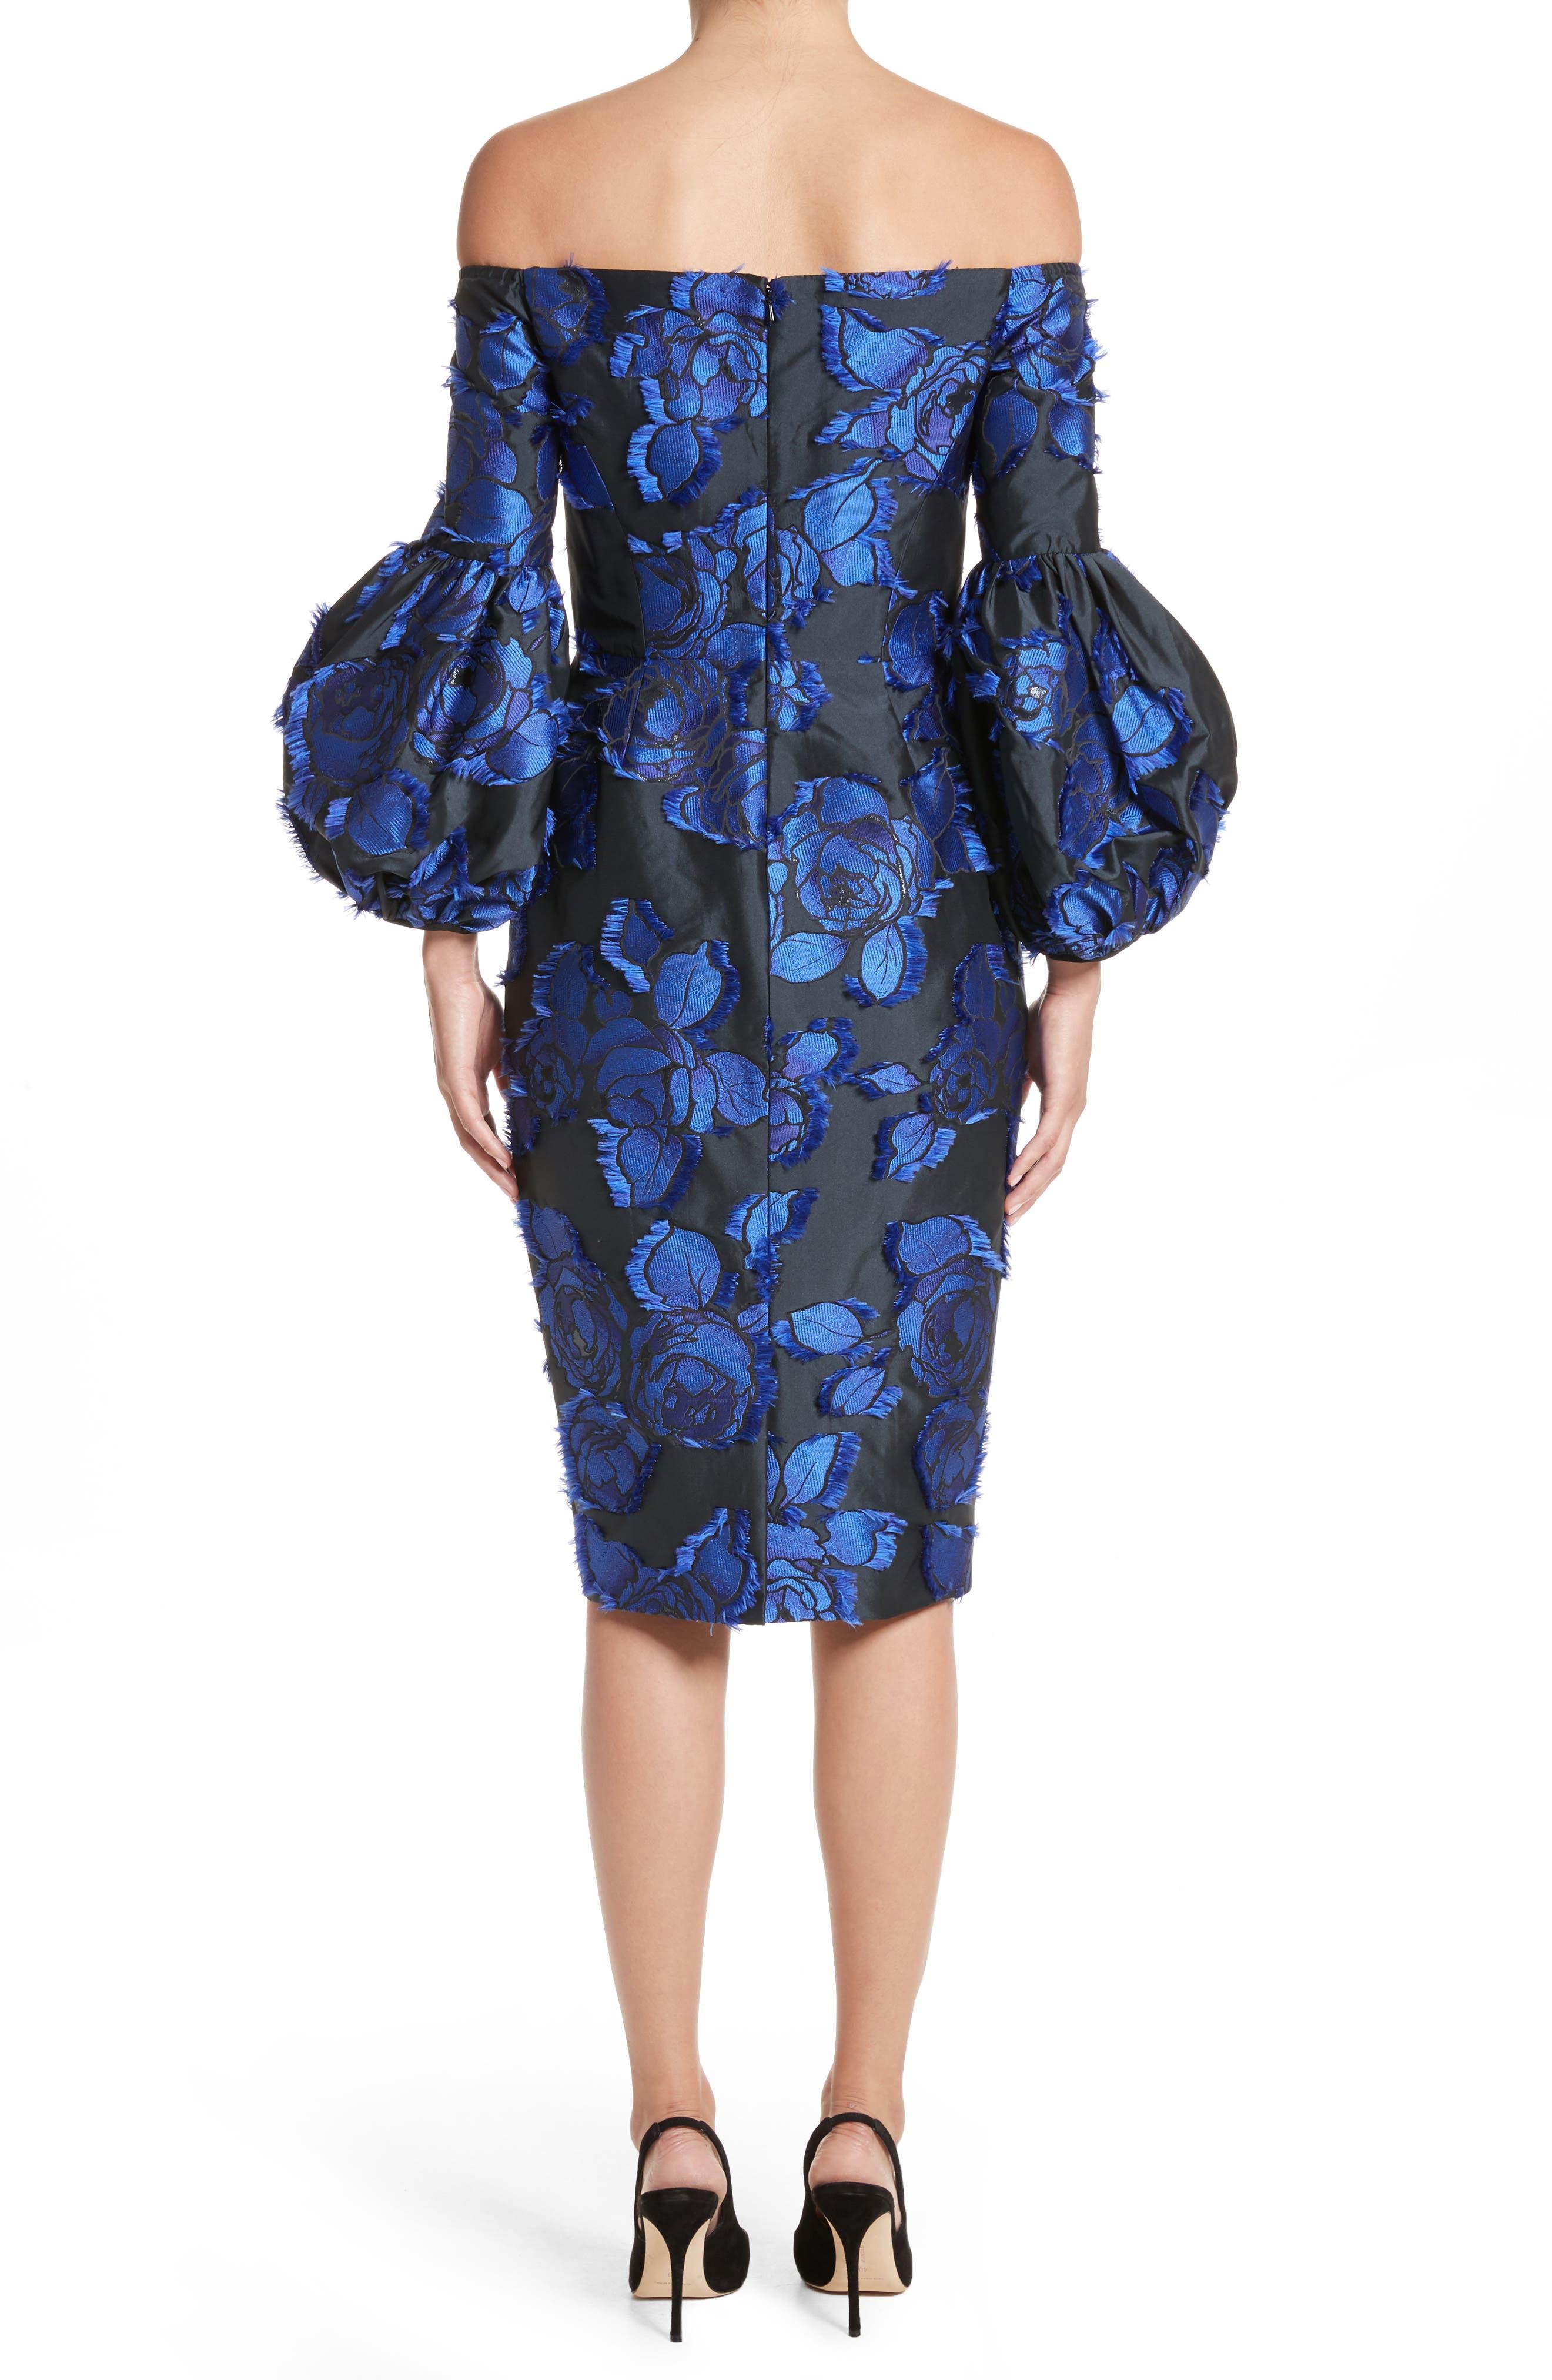 Fring Brocade Puff Sleeve Dress,                             Alternate thumbnail 2, color,                             001